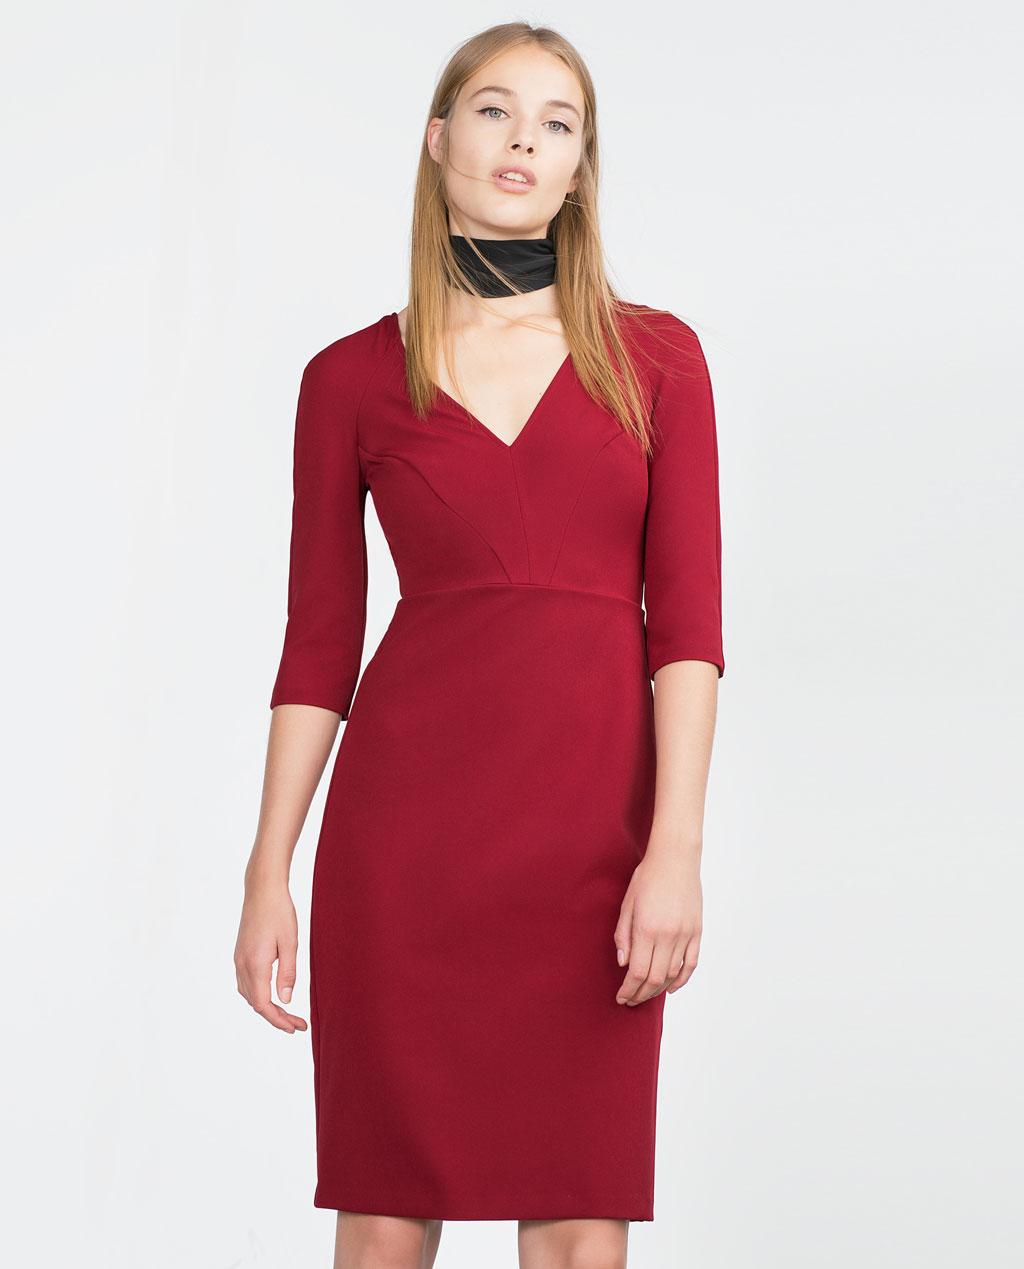 8f91b76c1a10 Rosso Primavera Online Stile Zara EstateModa Abito Con 0Nyv8nwOm